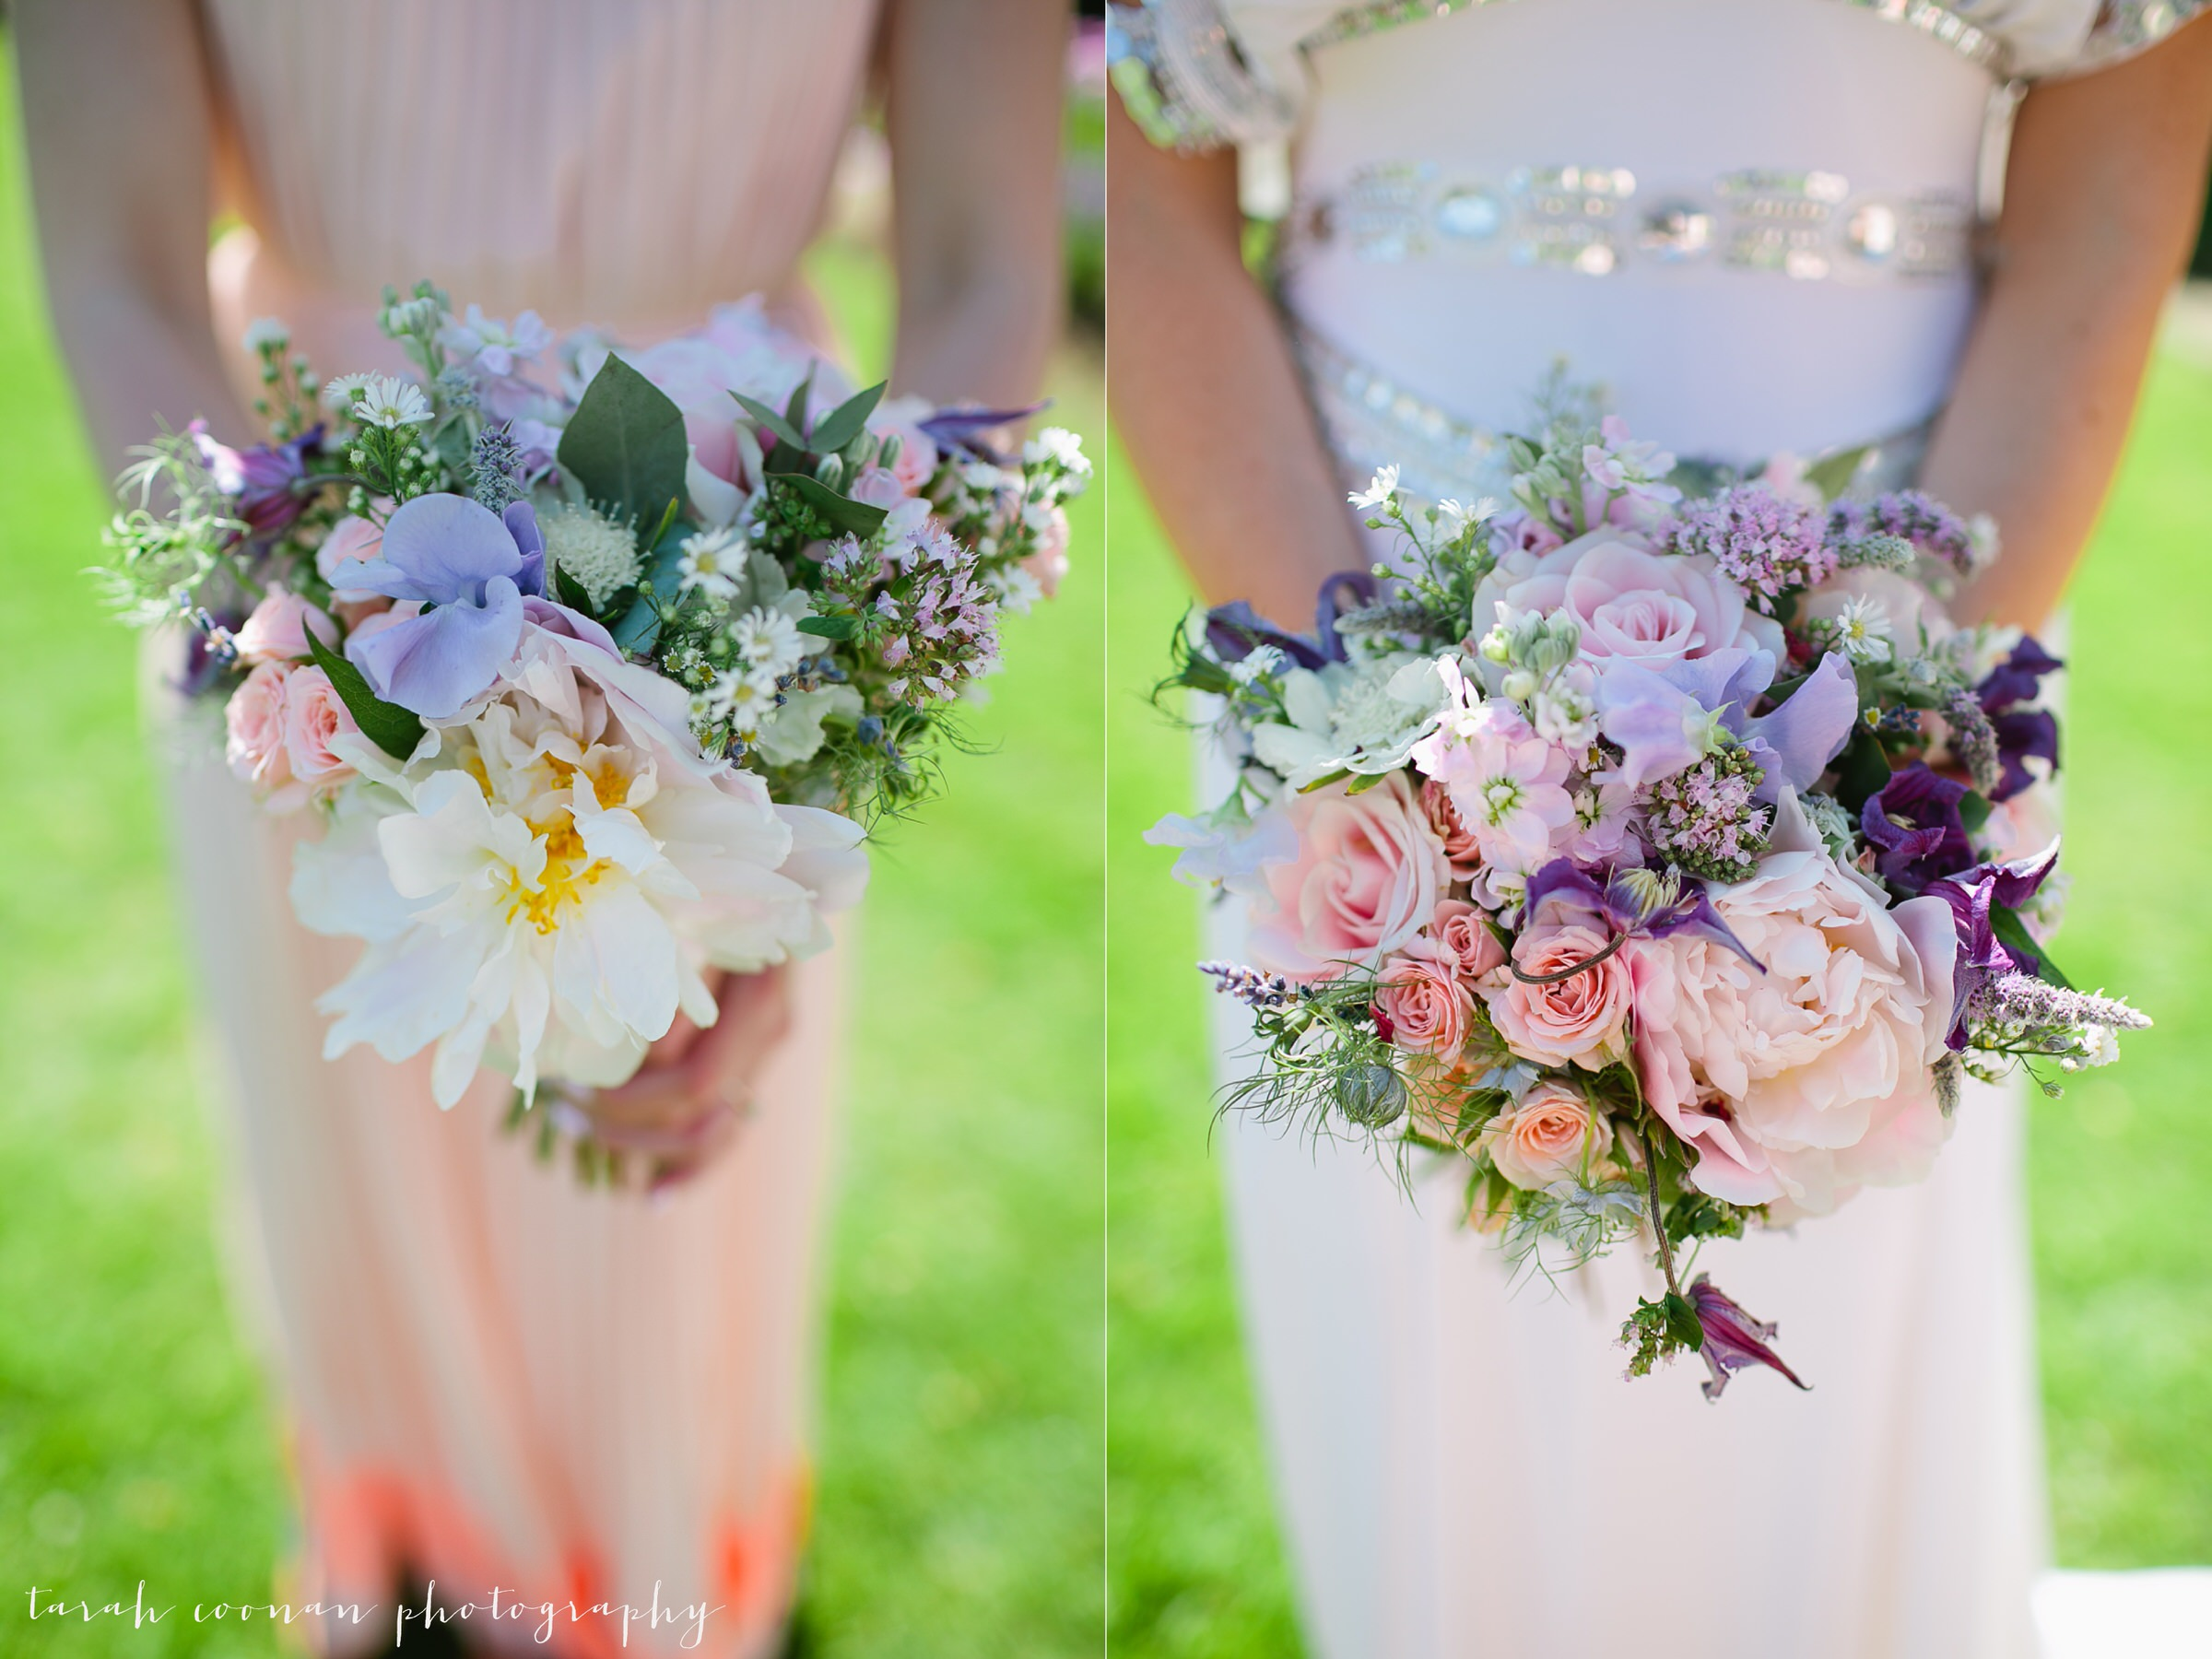 Daisy Lane Florals